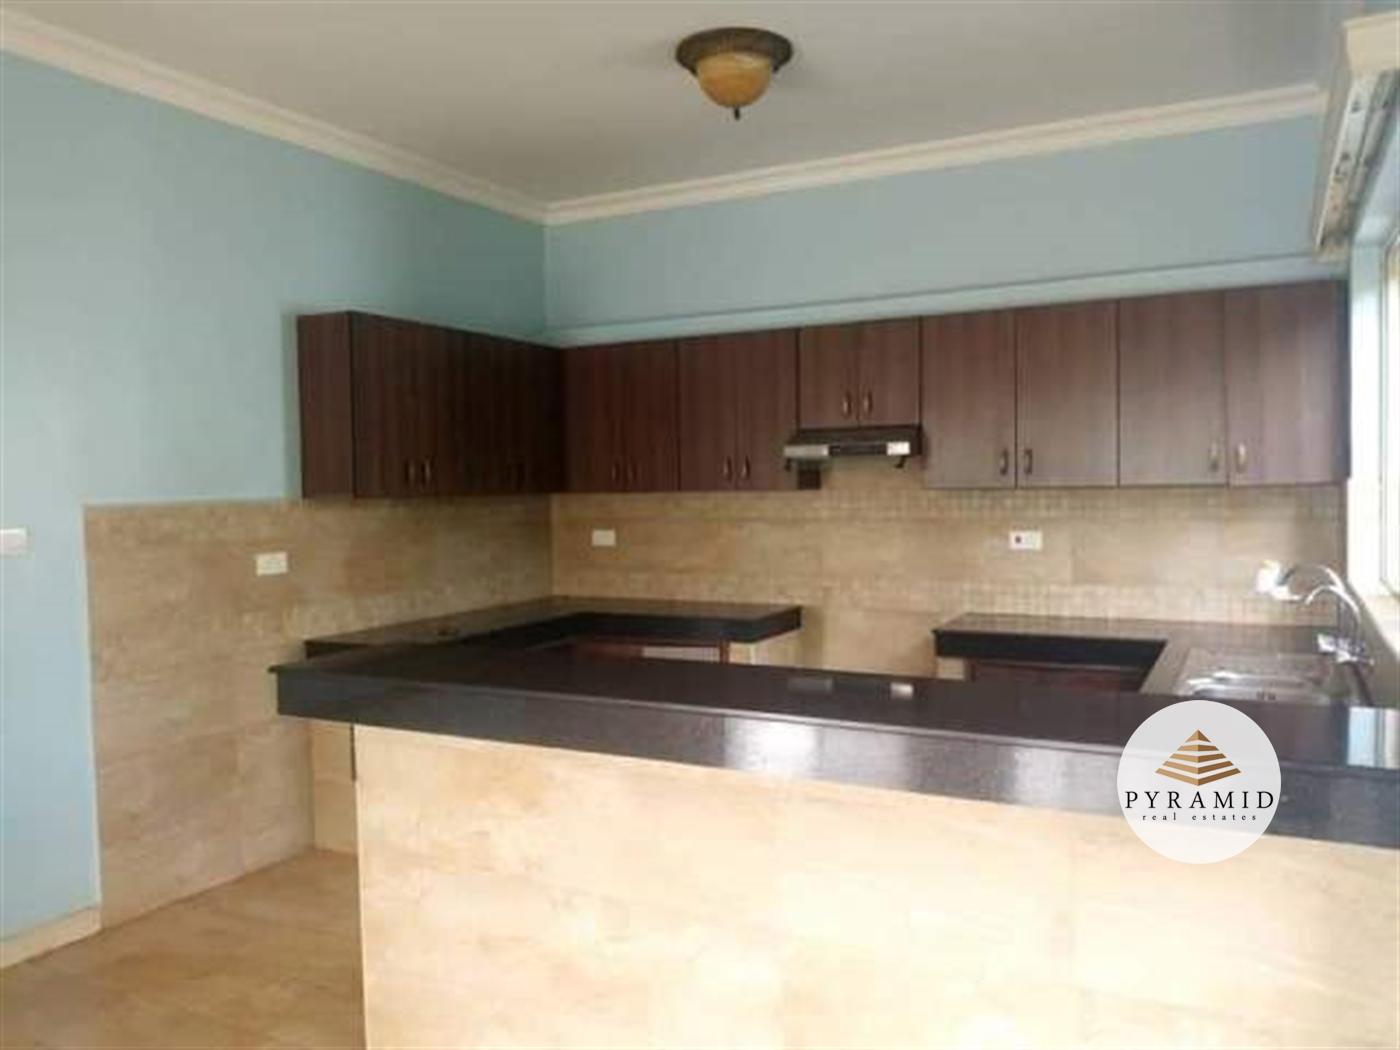 Duplex for rent in Luzira Kampala